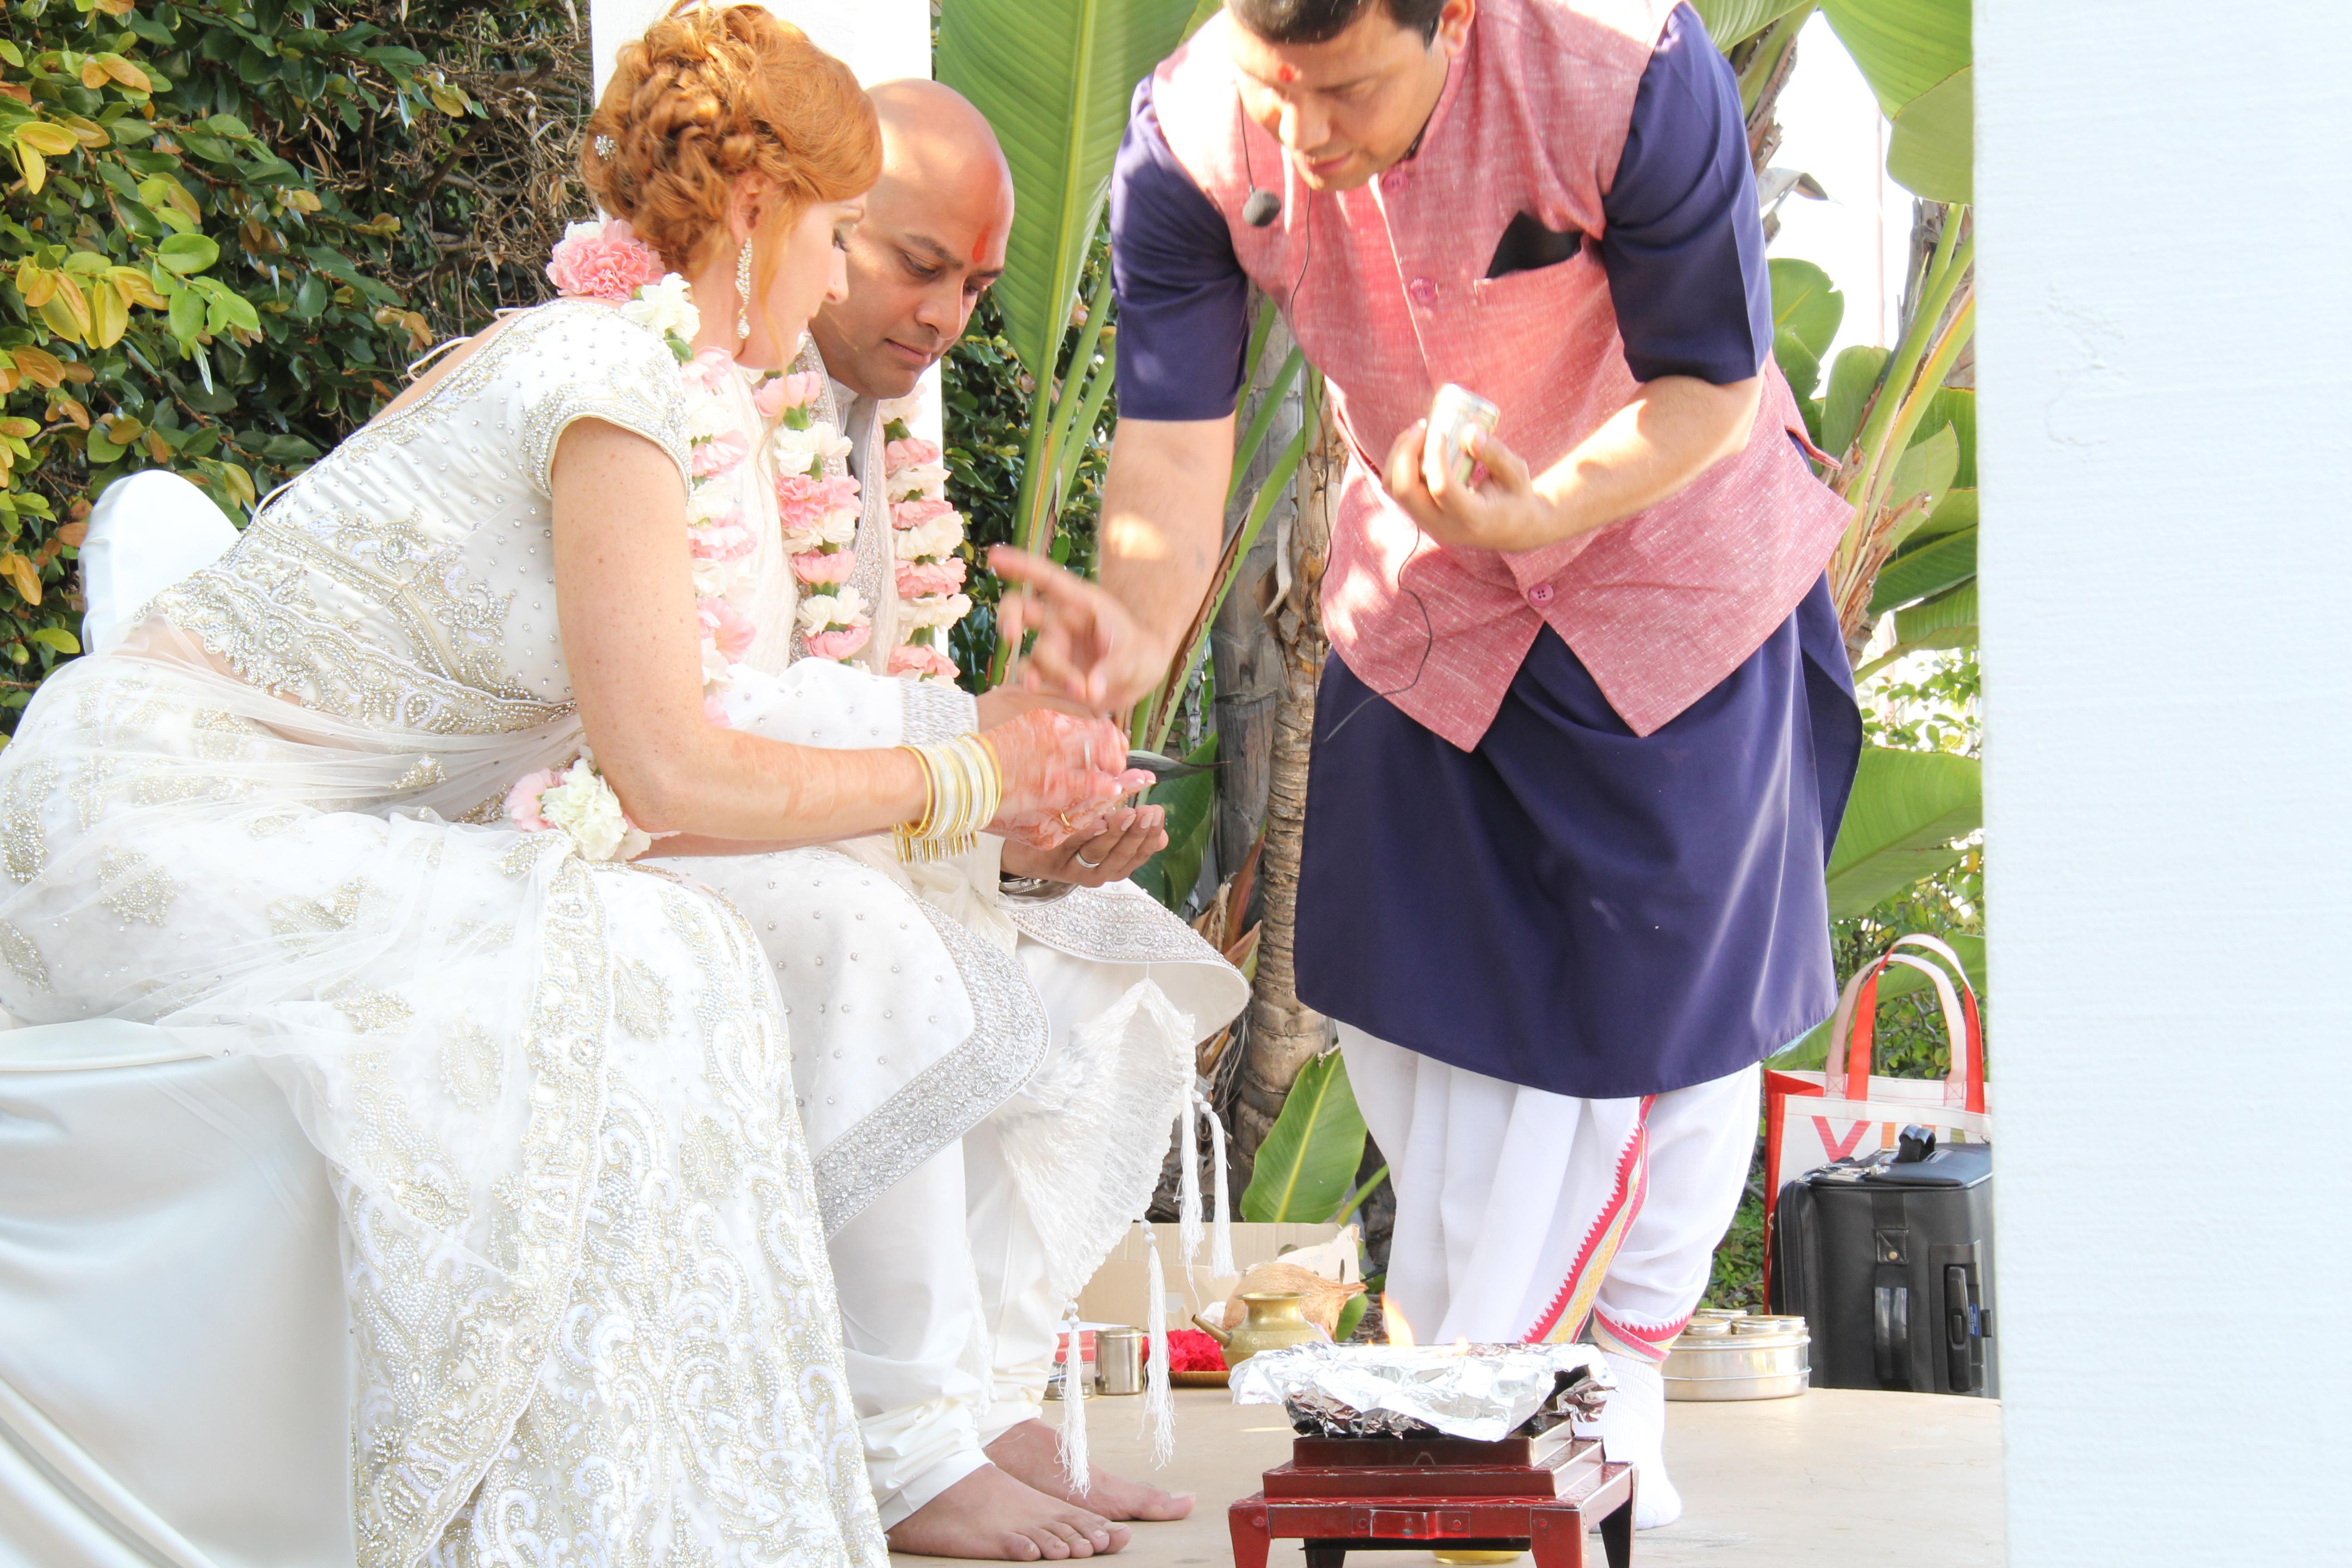 Christian and Hindu wedding April 2015